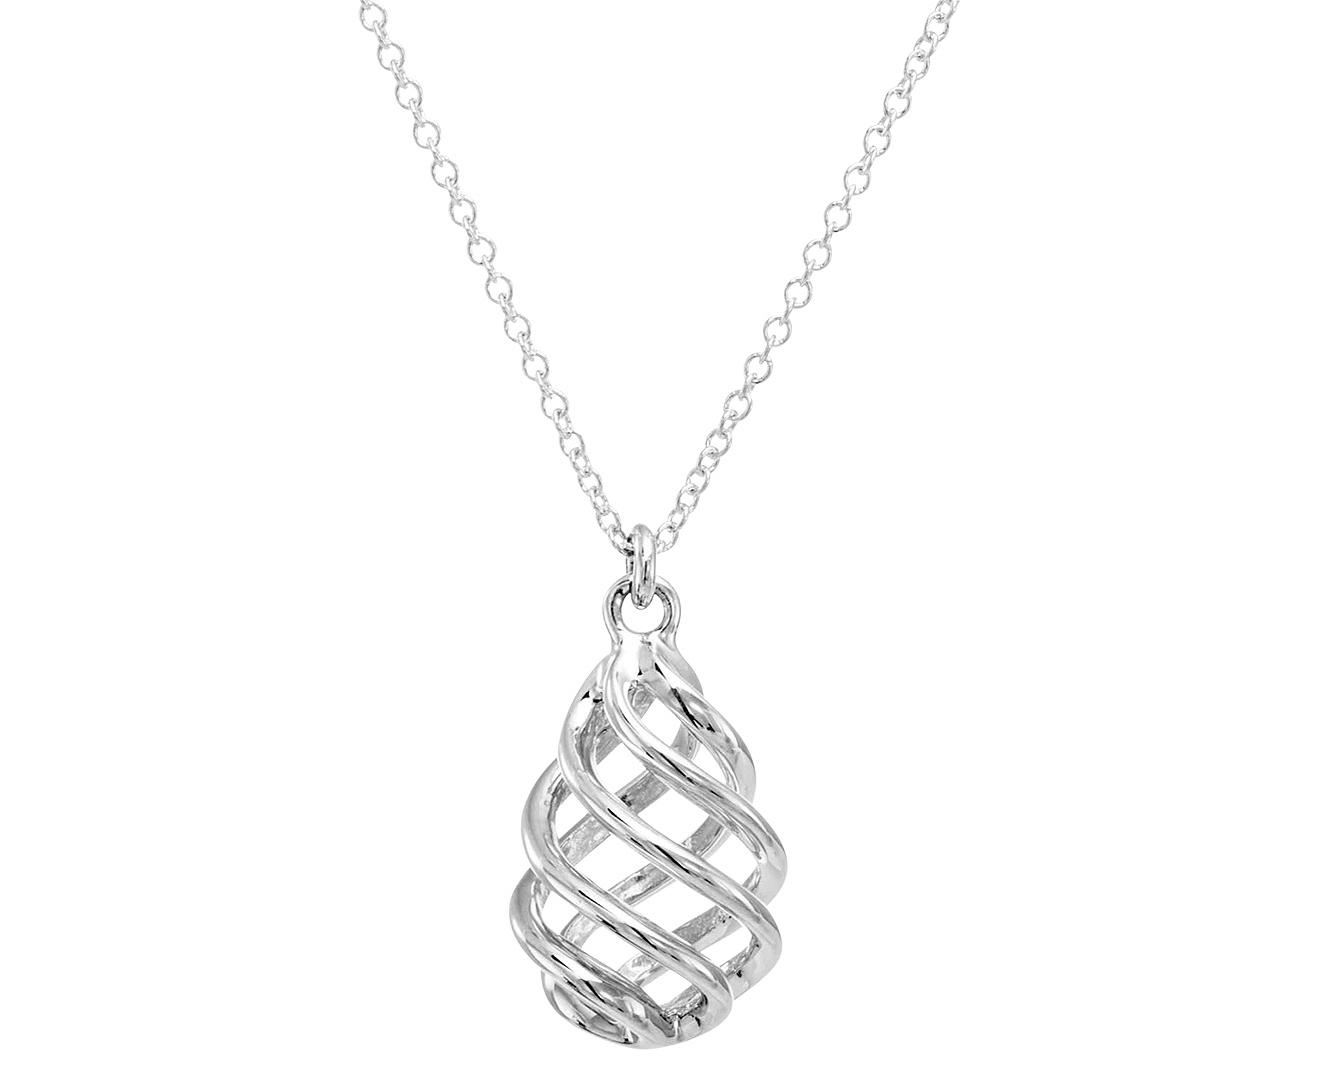 Tiffany Amp Co Paloma S Venezia Luce Pendant W Chain